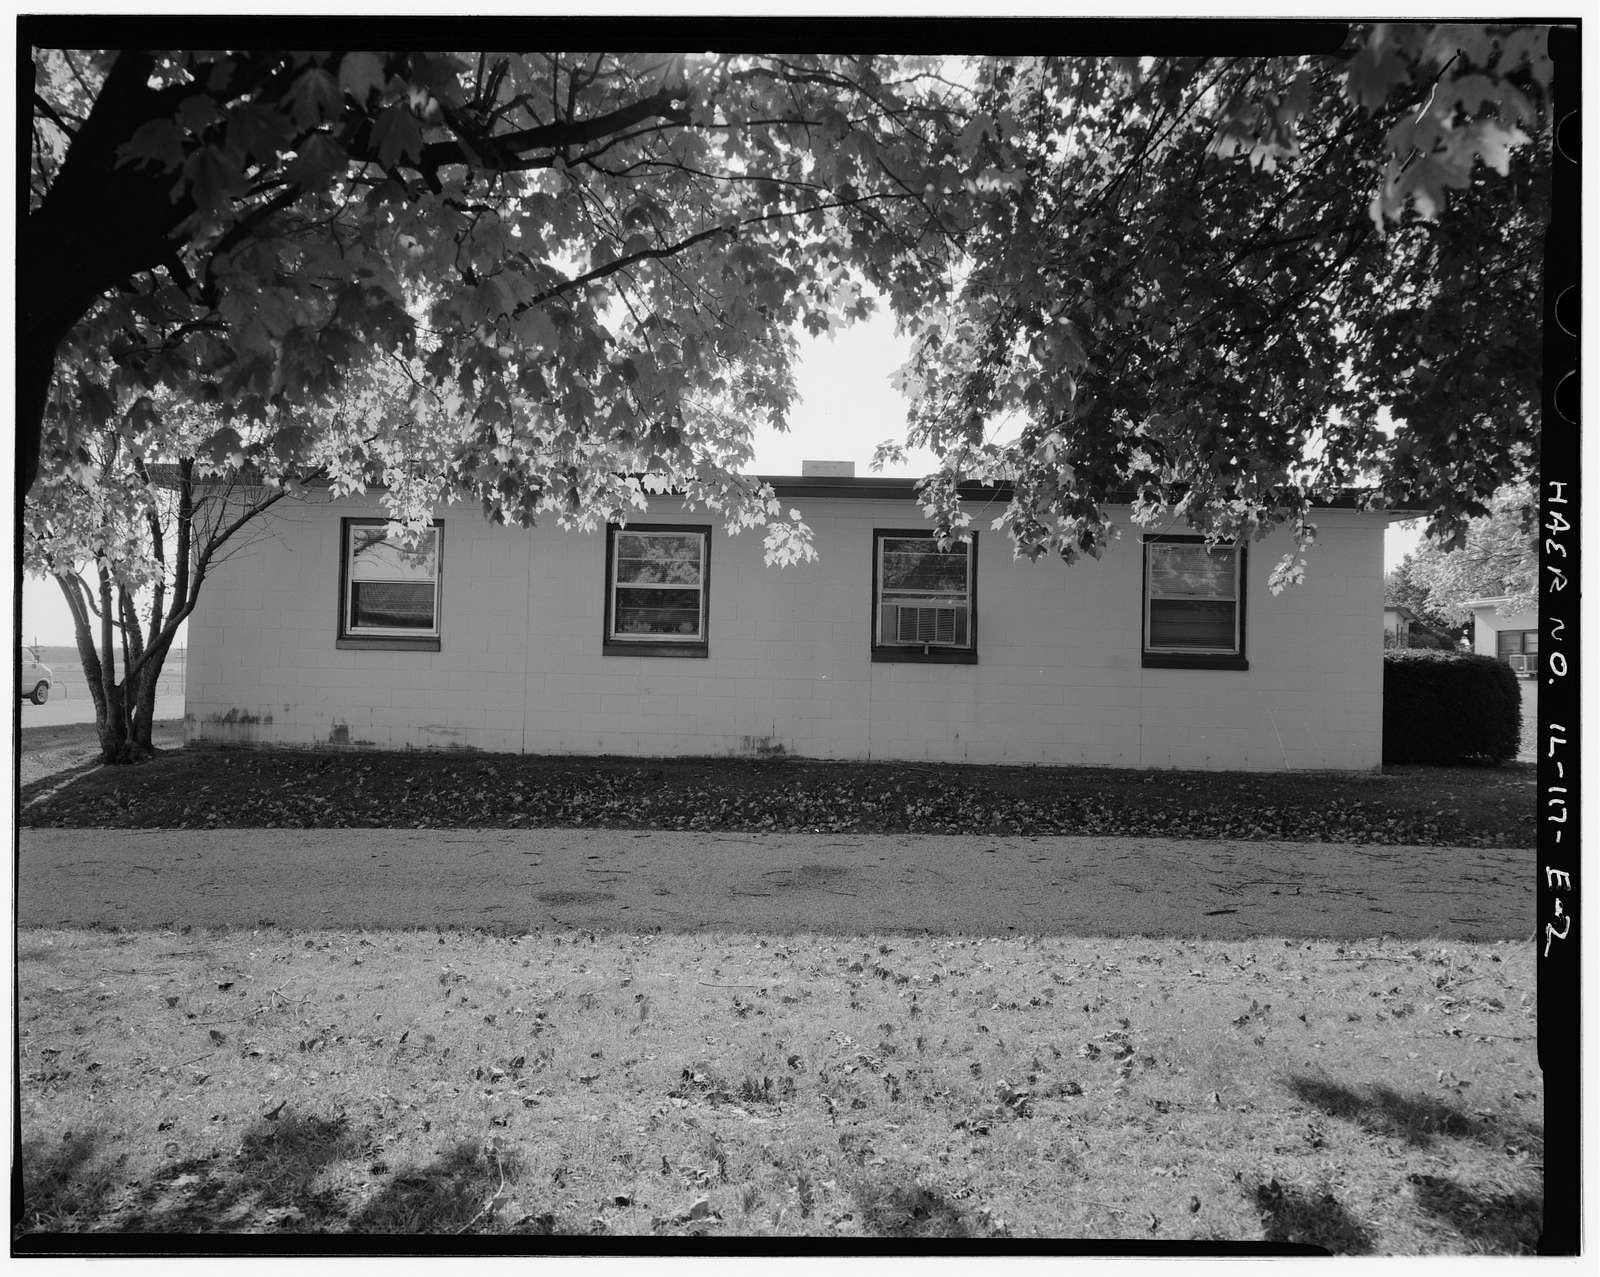 NIKE Missile Base SL-40, Barracks No. 2, North end of base, southeast of Barracks No. 1 & northeast of Mess Hall, Hecker, Monroe County, IL